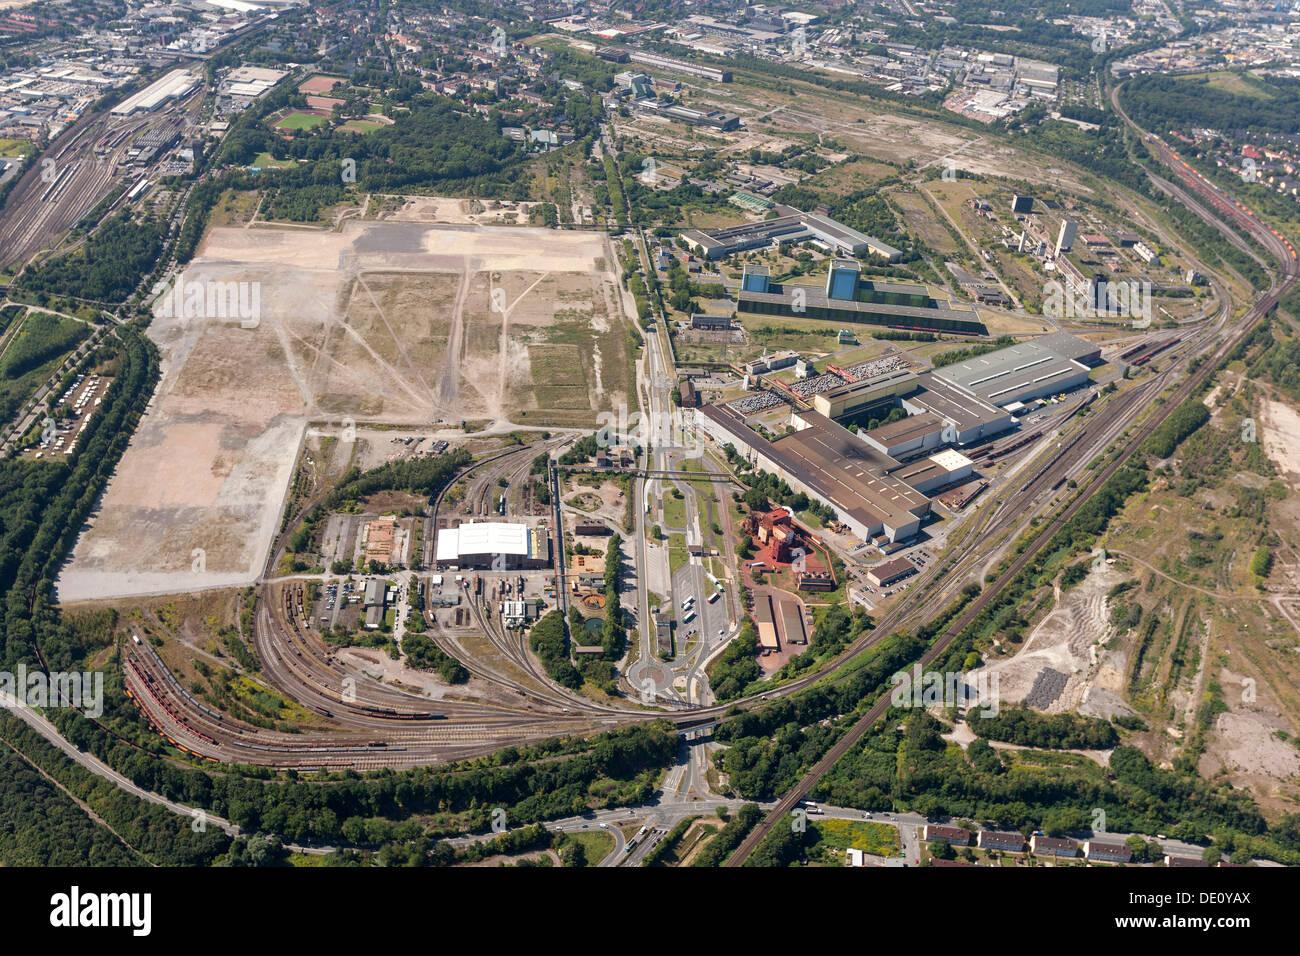 Aerial view, industrial wasteland, ThyssenKrupp Logistik, Hoesch-area, Dortmund, Ruhr area, North Rhine-Westphalia - Stock Image